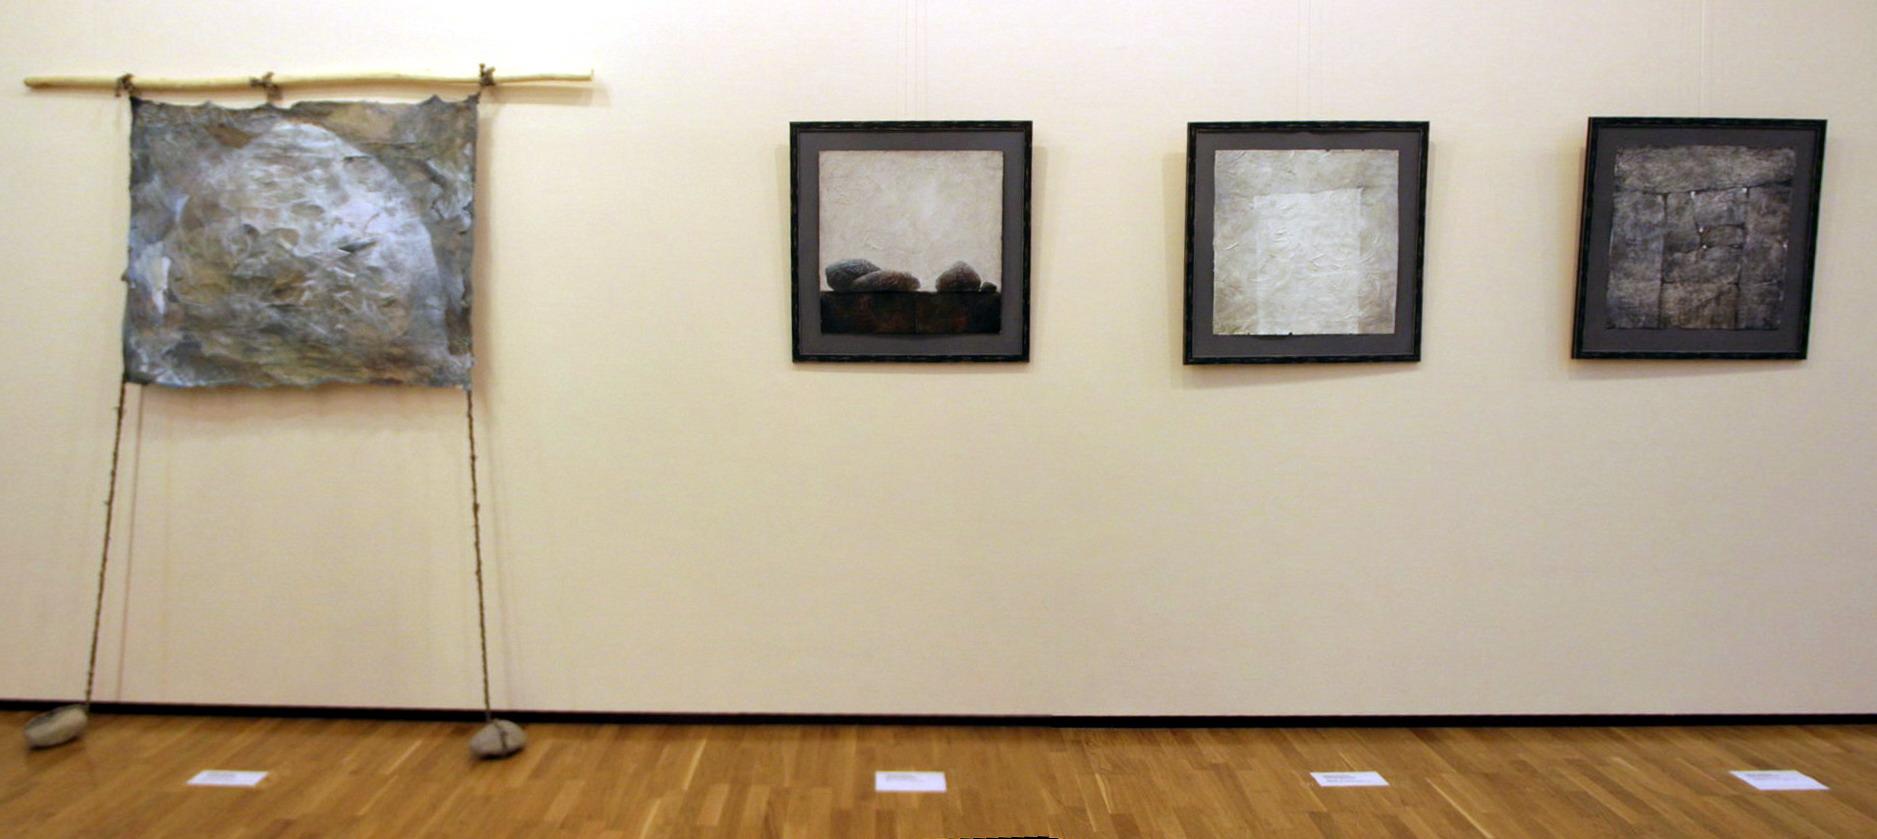 Алексей Дмитриев. Экспозиция работ